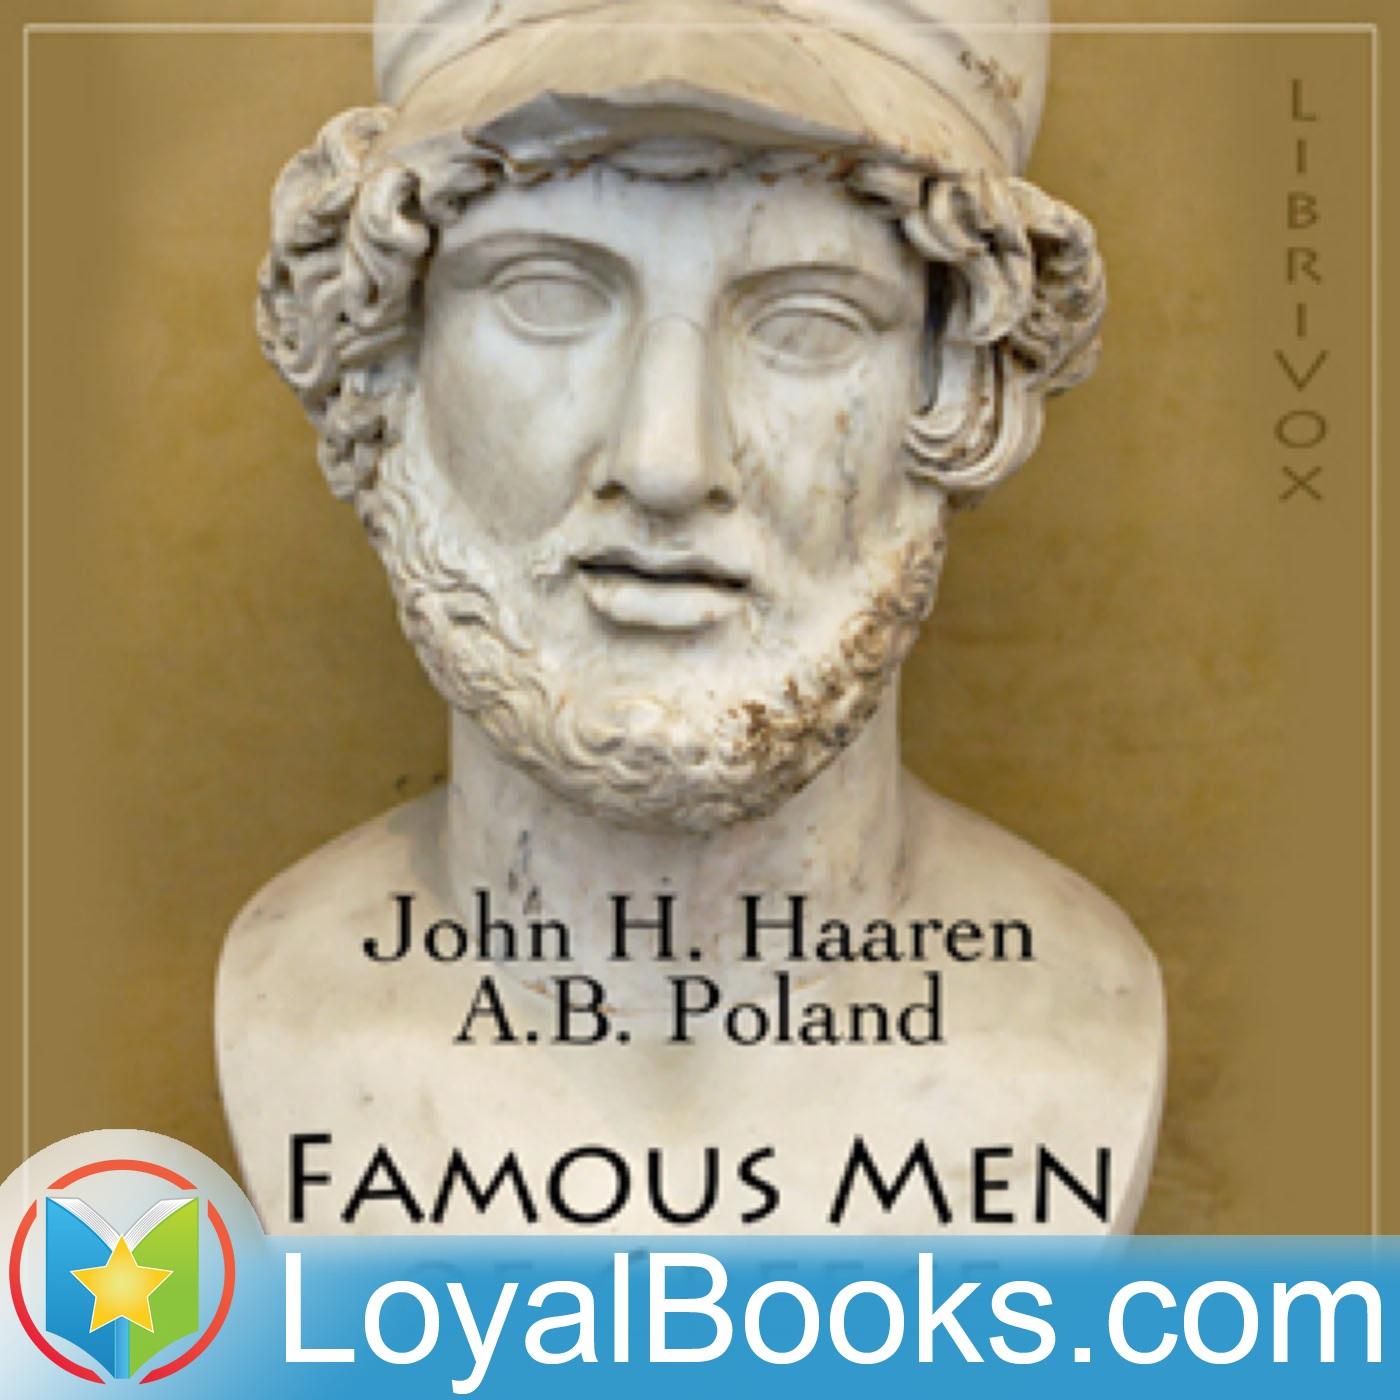 <![CDATA[Famous Men of Greece by John H. Haaren]]>